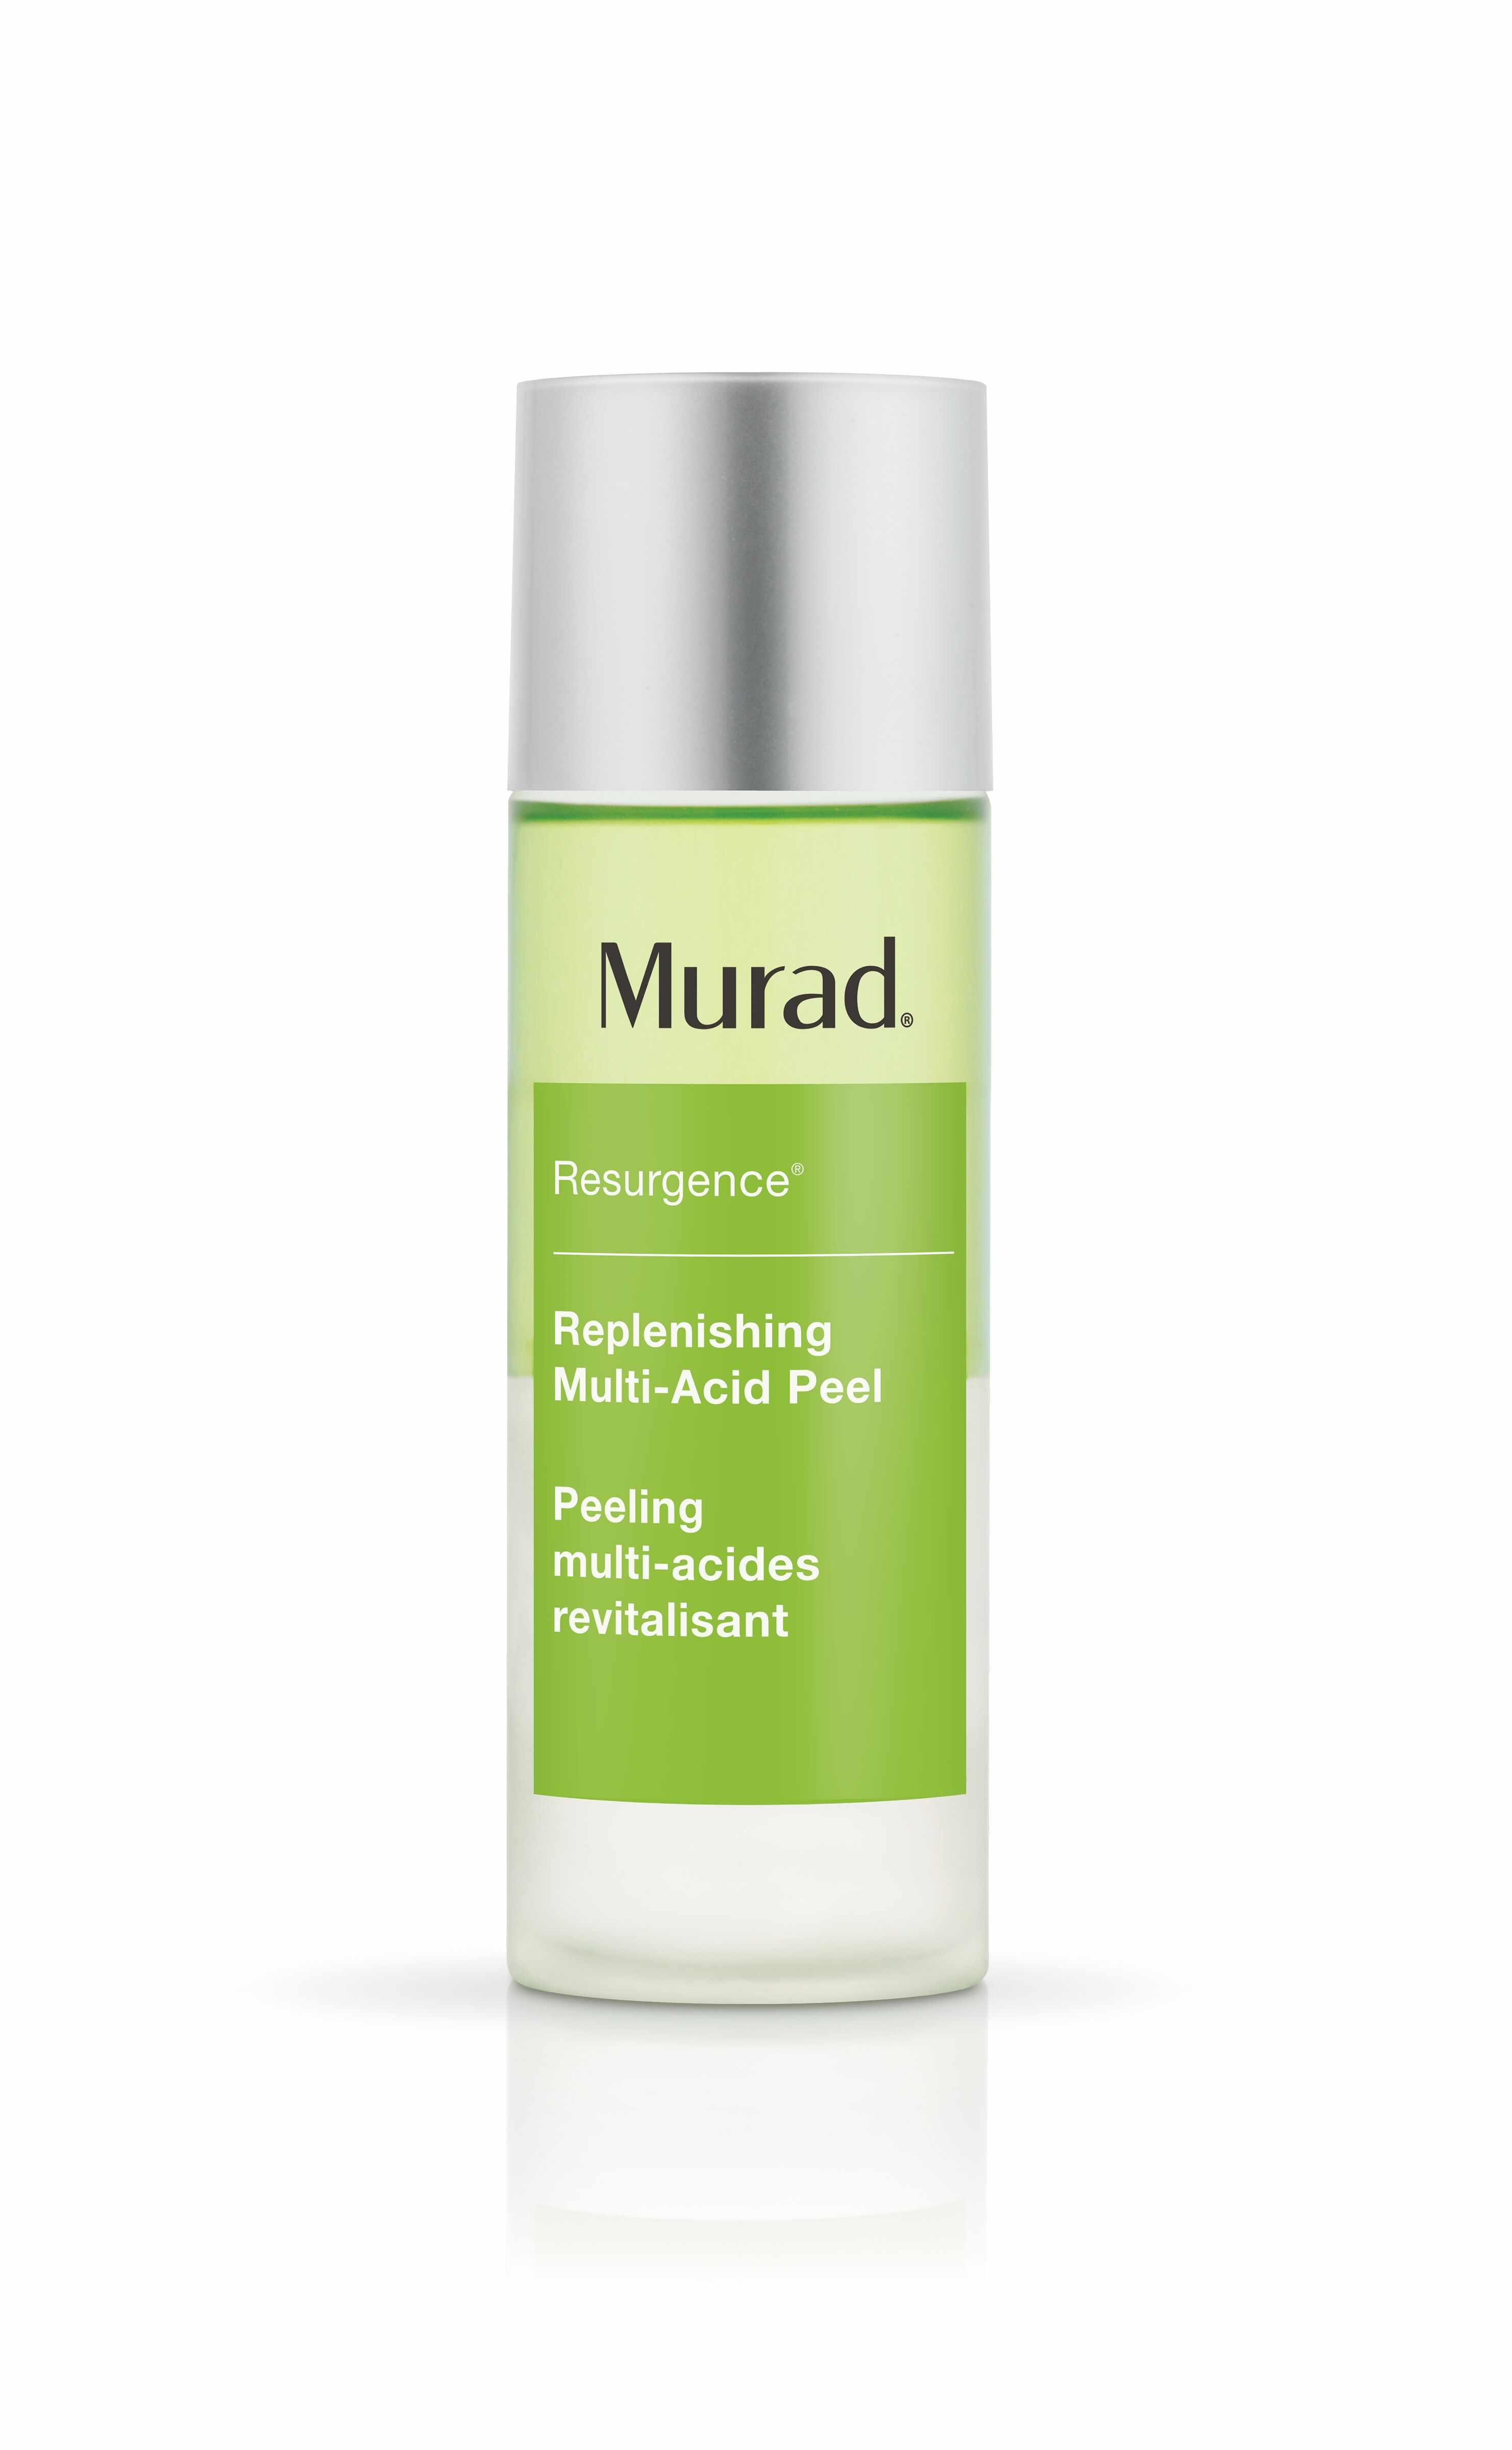 Murad Replenishing Multi-Acid Peel